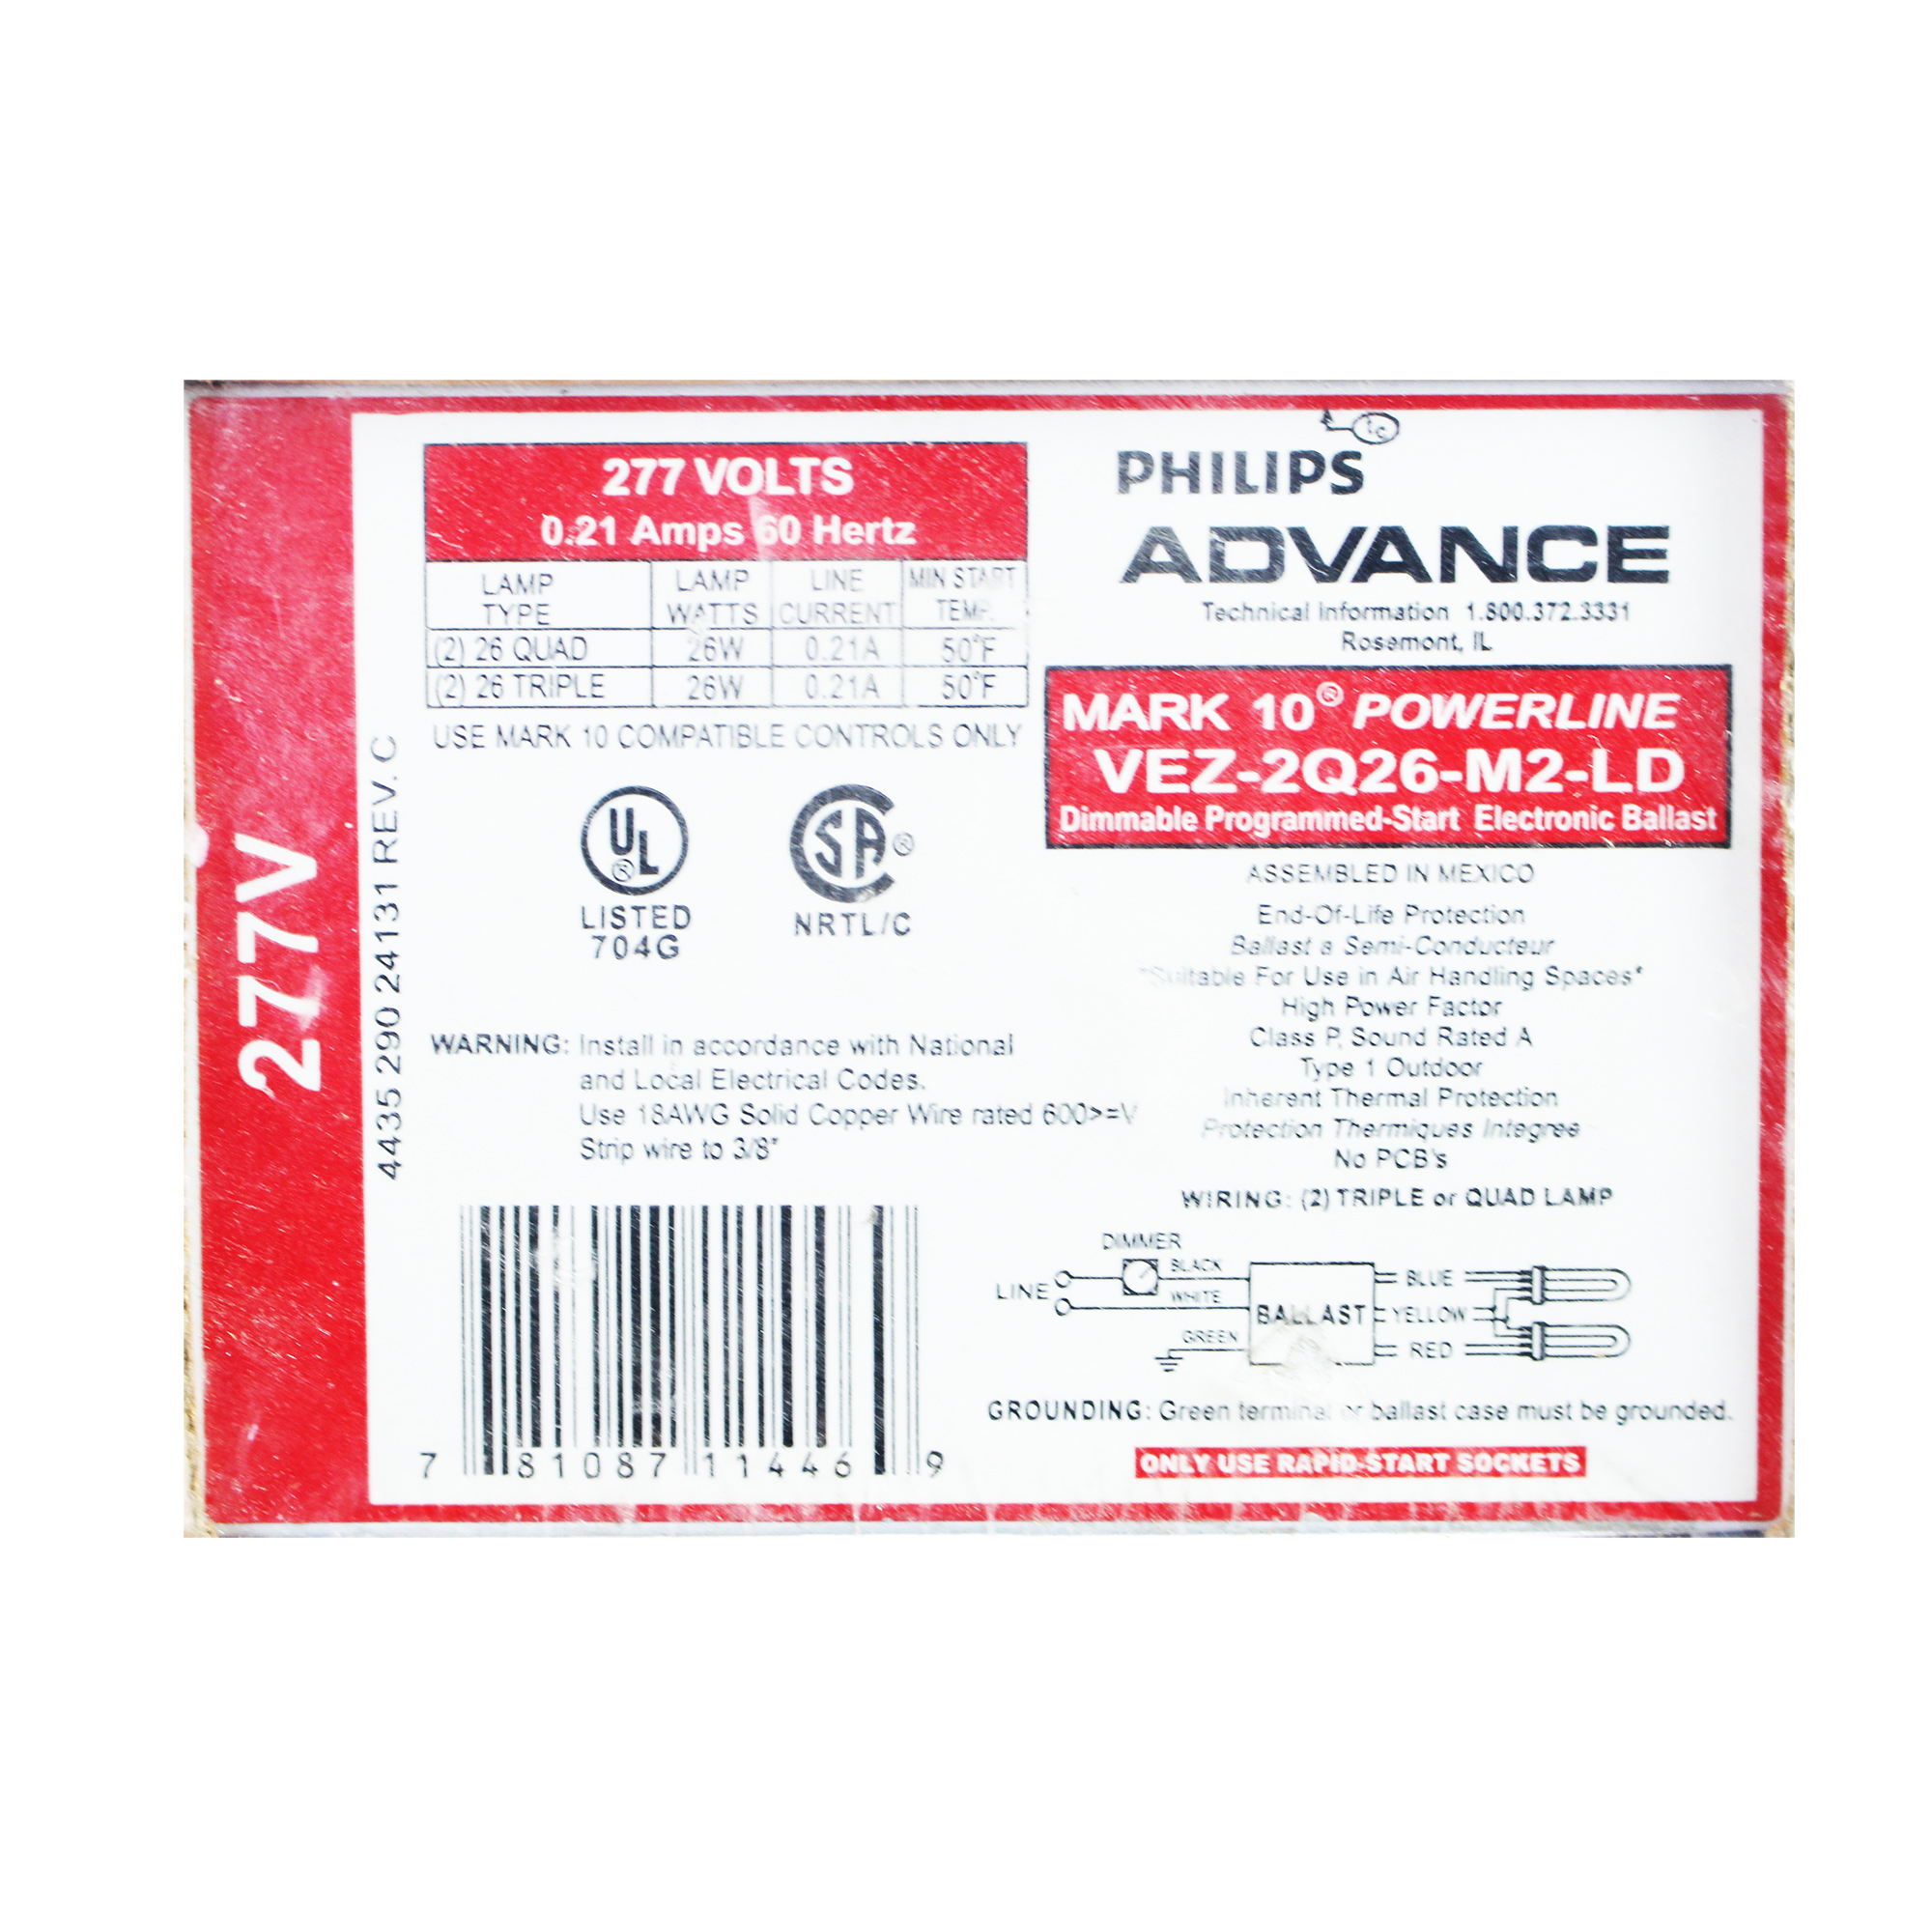 Advance 11447 - VEZ-2Q26-M2-LD Compact Fluorescent Ballast